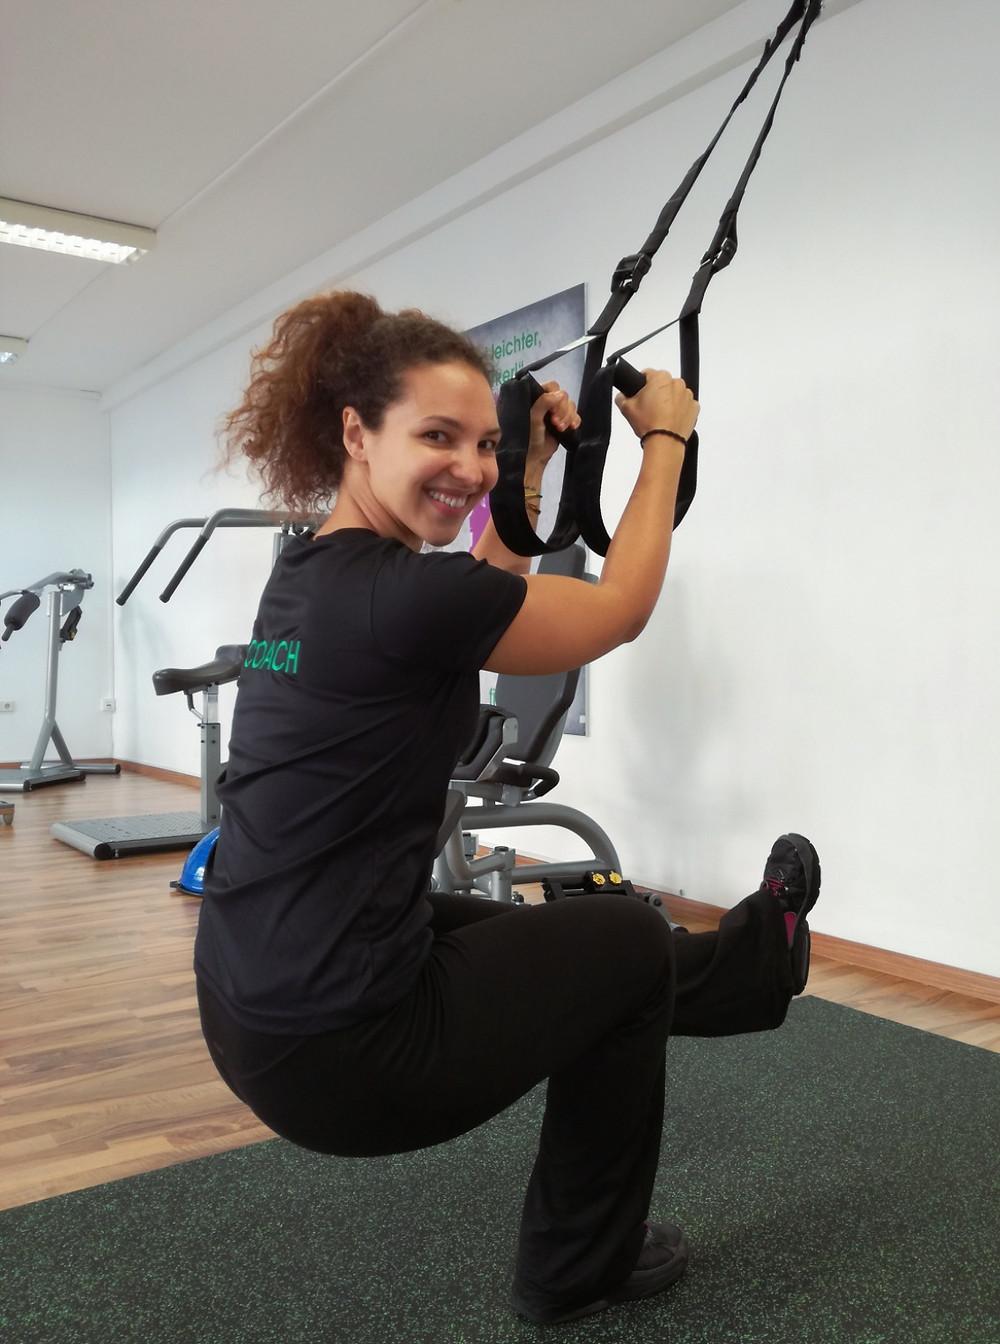 Sling-Training in der fitboutique